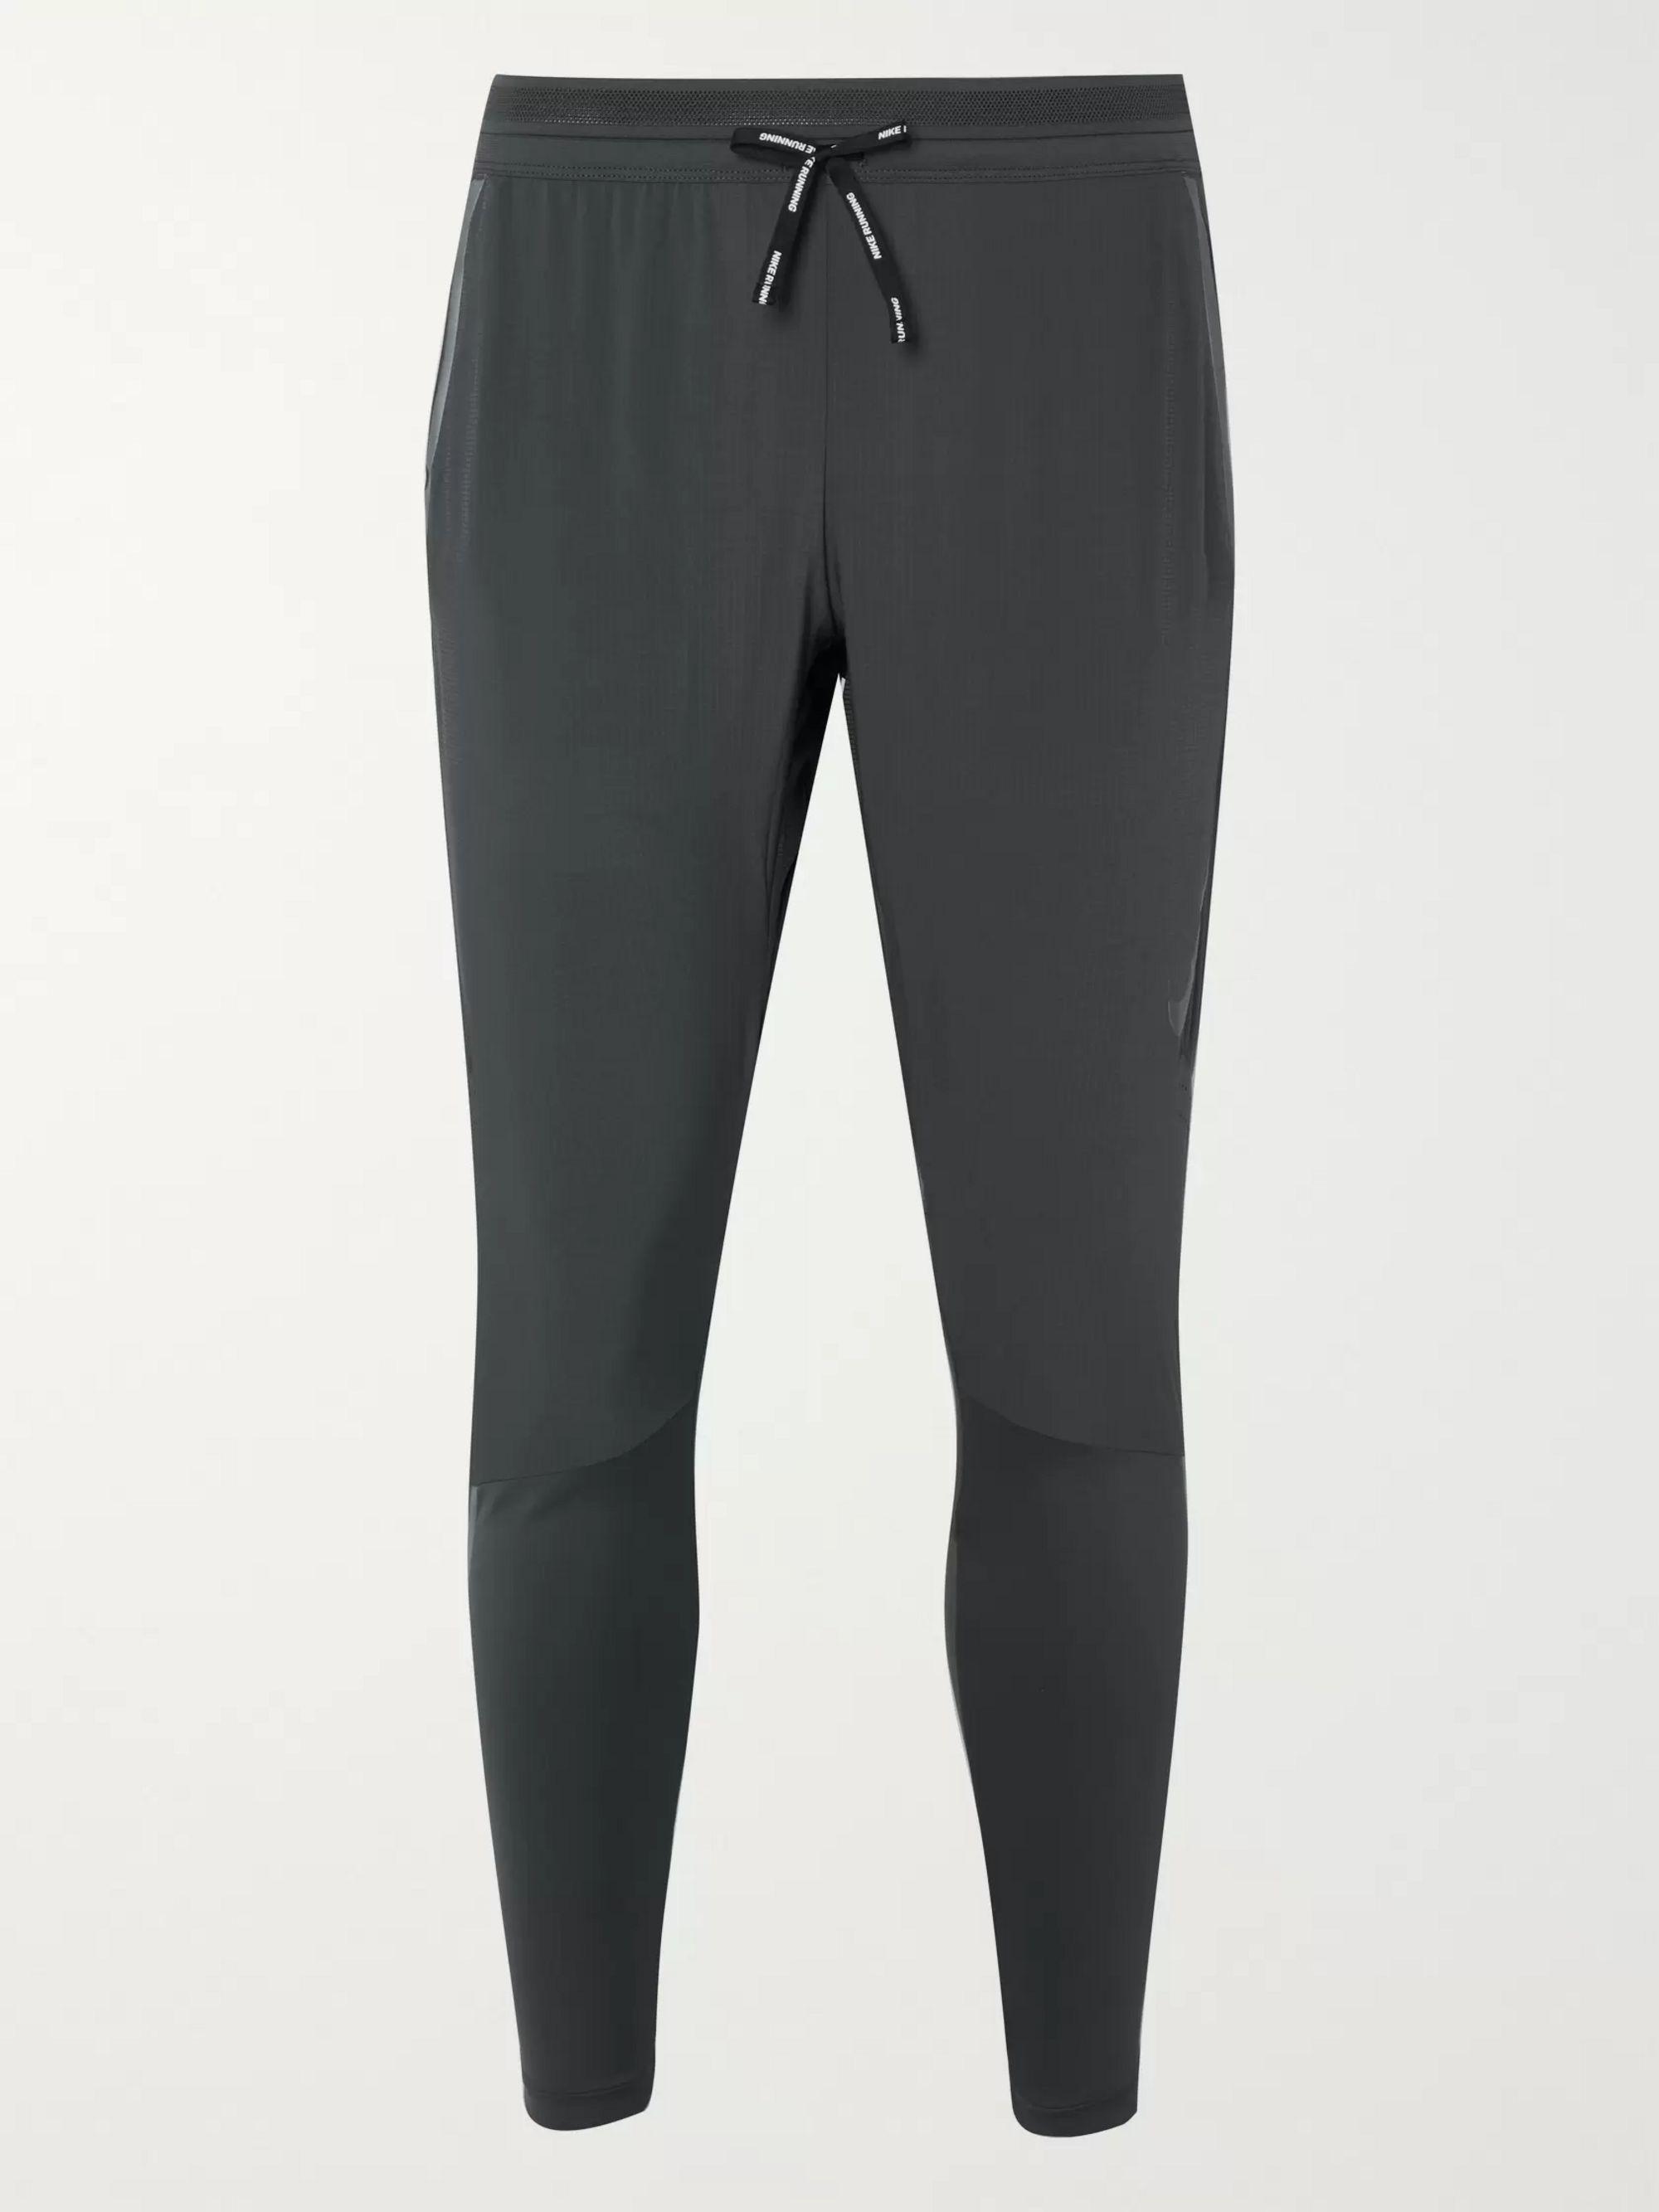 Gray Swift Slim-Fit Tapered Perforated Flex Dri-FIT Sweatpants | Nike Running | MR PORTER